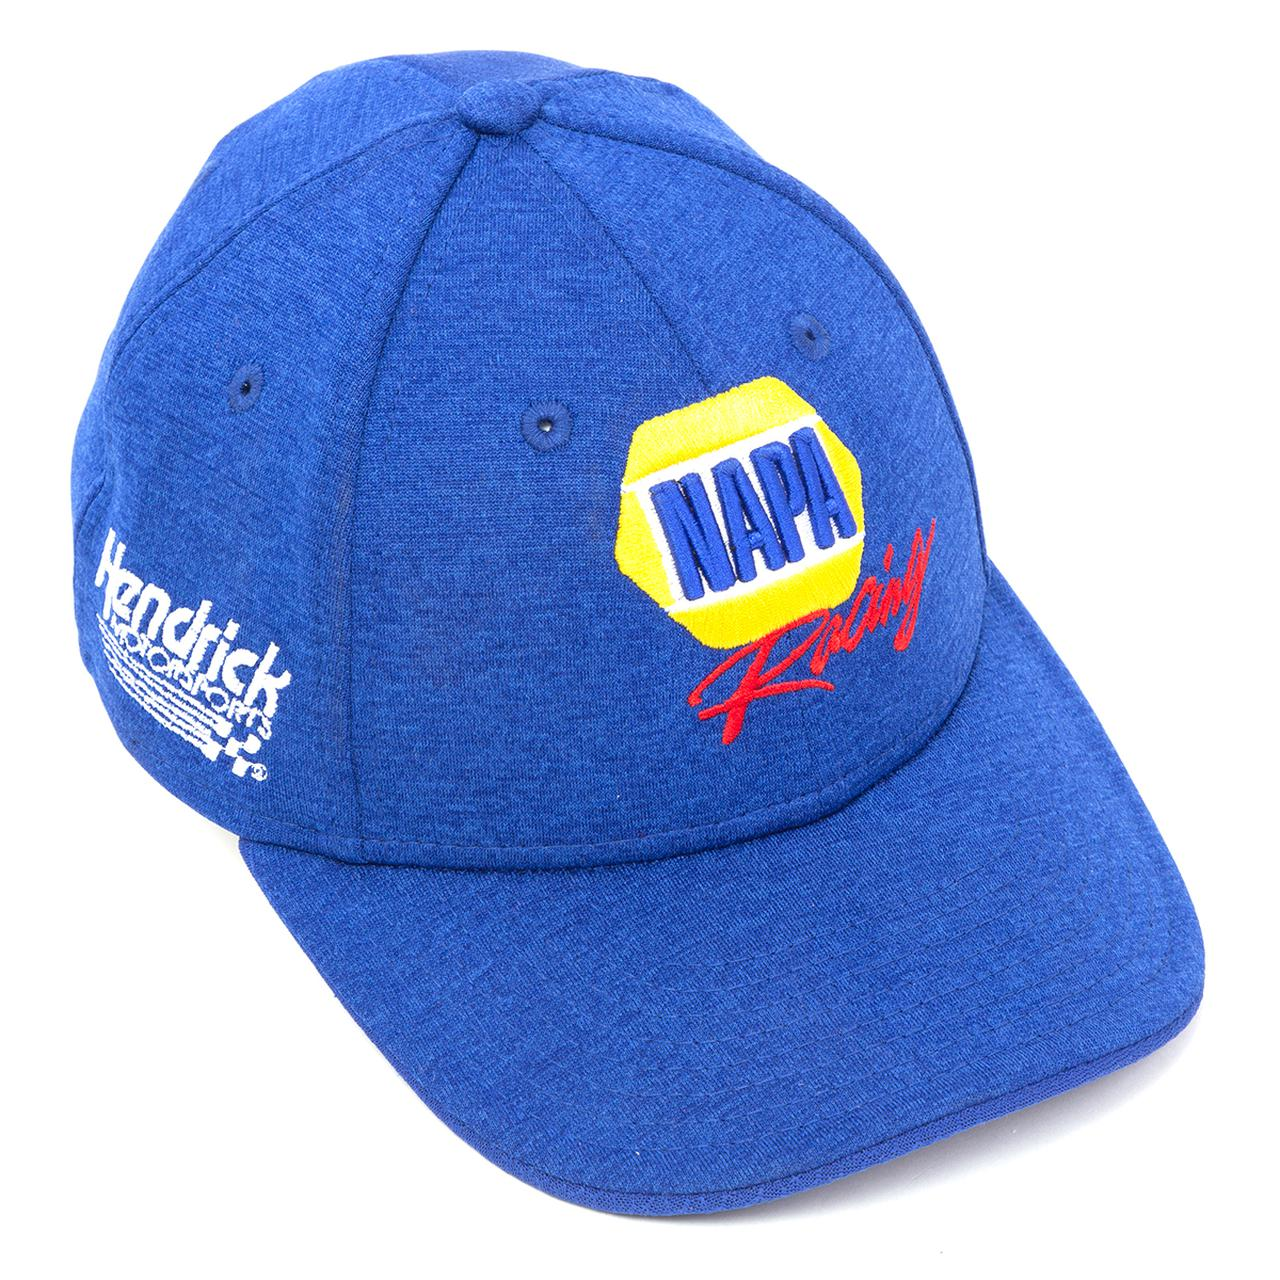 Hendrick Motorsports. Chase Elliott  9 2018 NAPA Driver Youth 940 Adjustable  Hat 7fcd054f605c